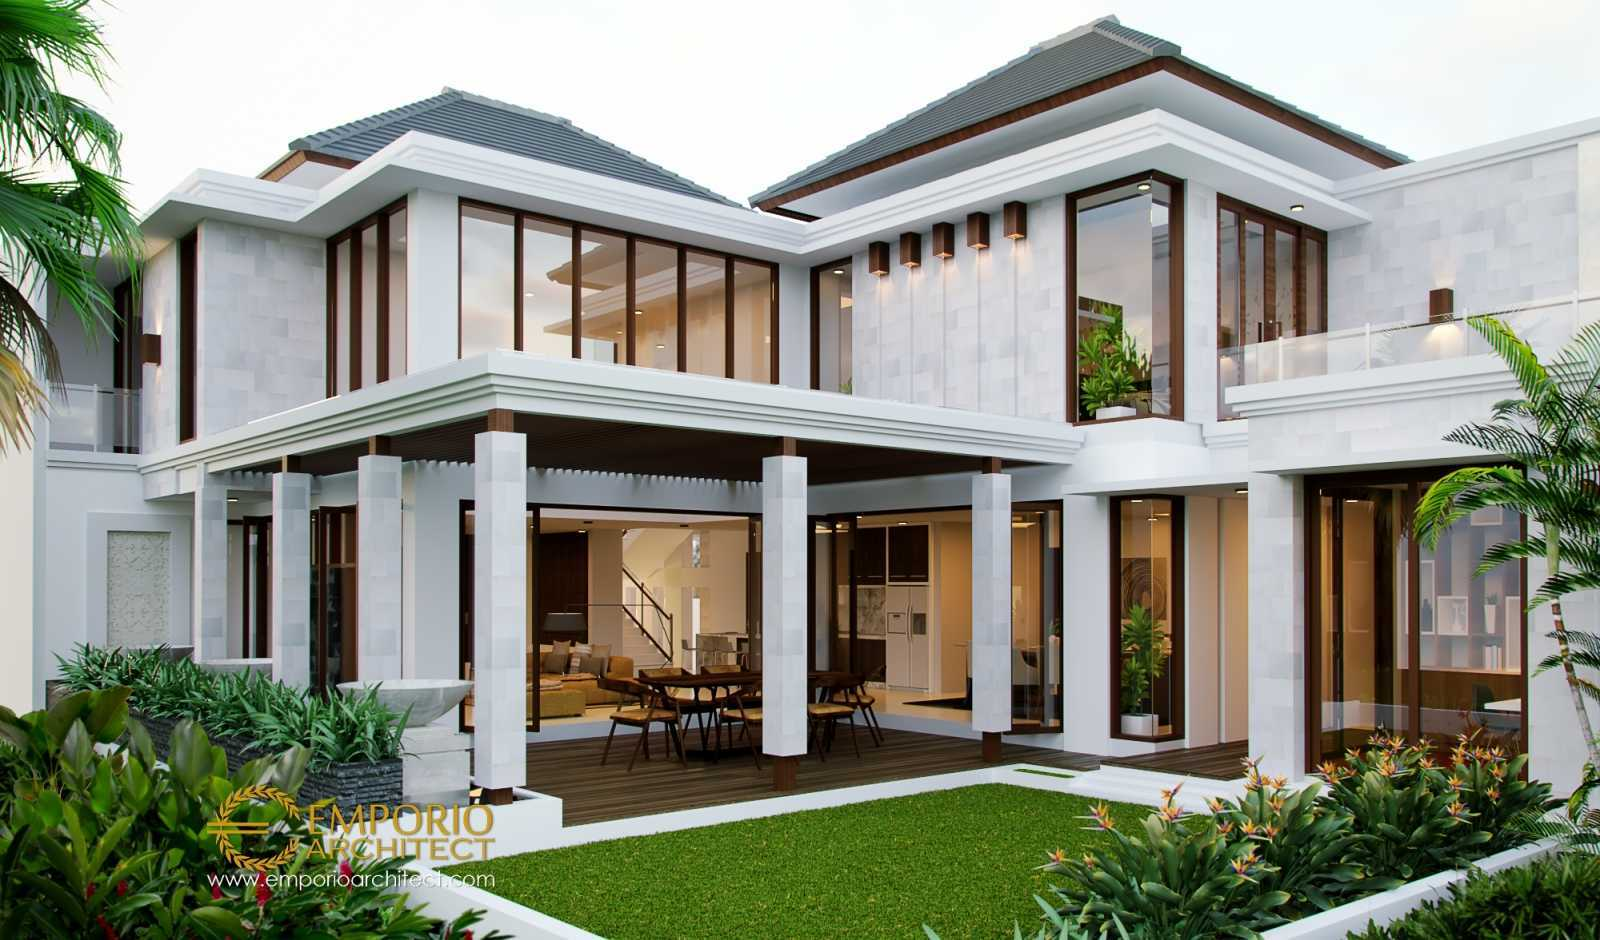 Emporio Architect Desain Rumah Villa Bali Tropis 495 @ Cikarang, Bekasi Cikarang, Bekasi, Jawa Barat, Indonesia Cikarang, Bekasi, Jawa Barat, Indonesia Emporio-Architect-Desain-Rumah-Villa-Bali-Tropis-495-Cikarang-Bekasi  78306